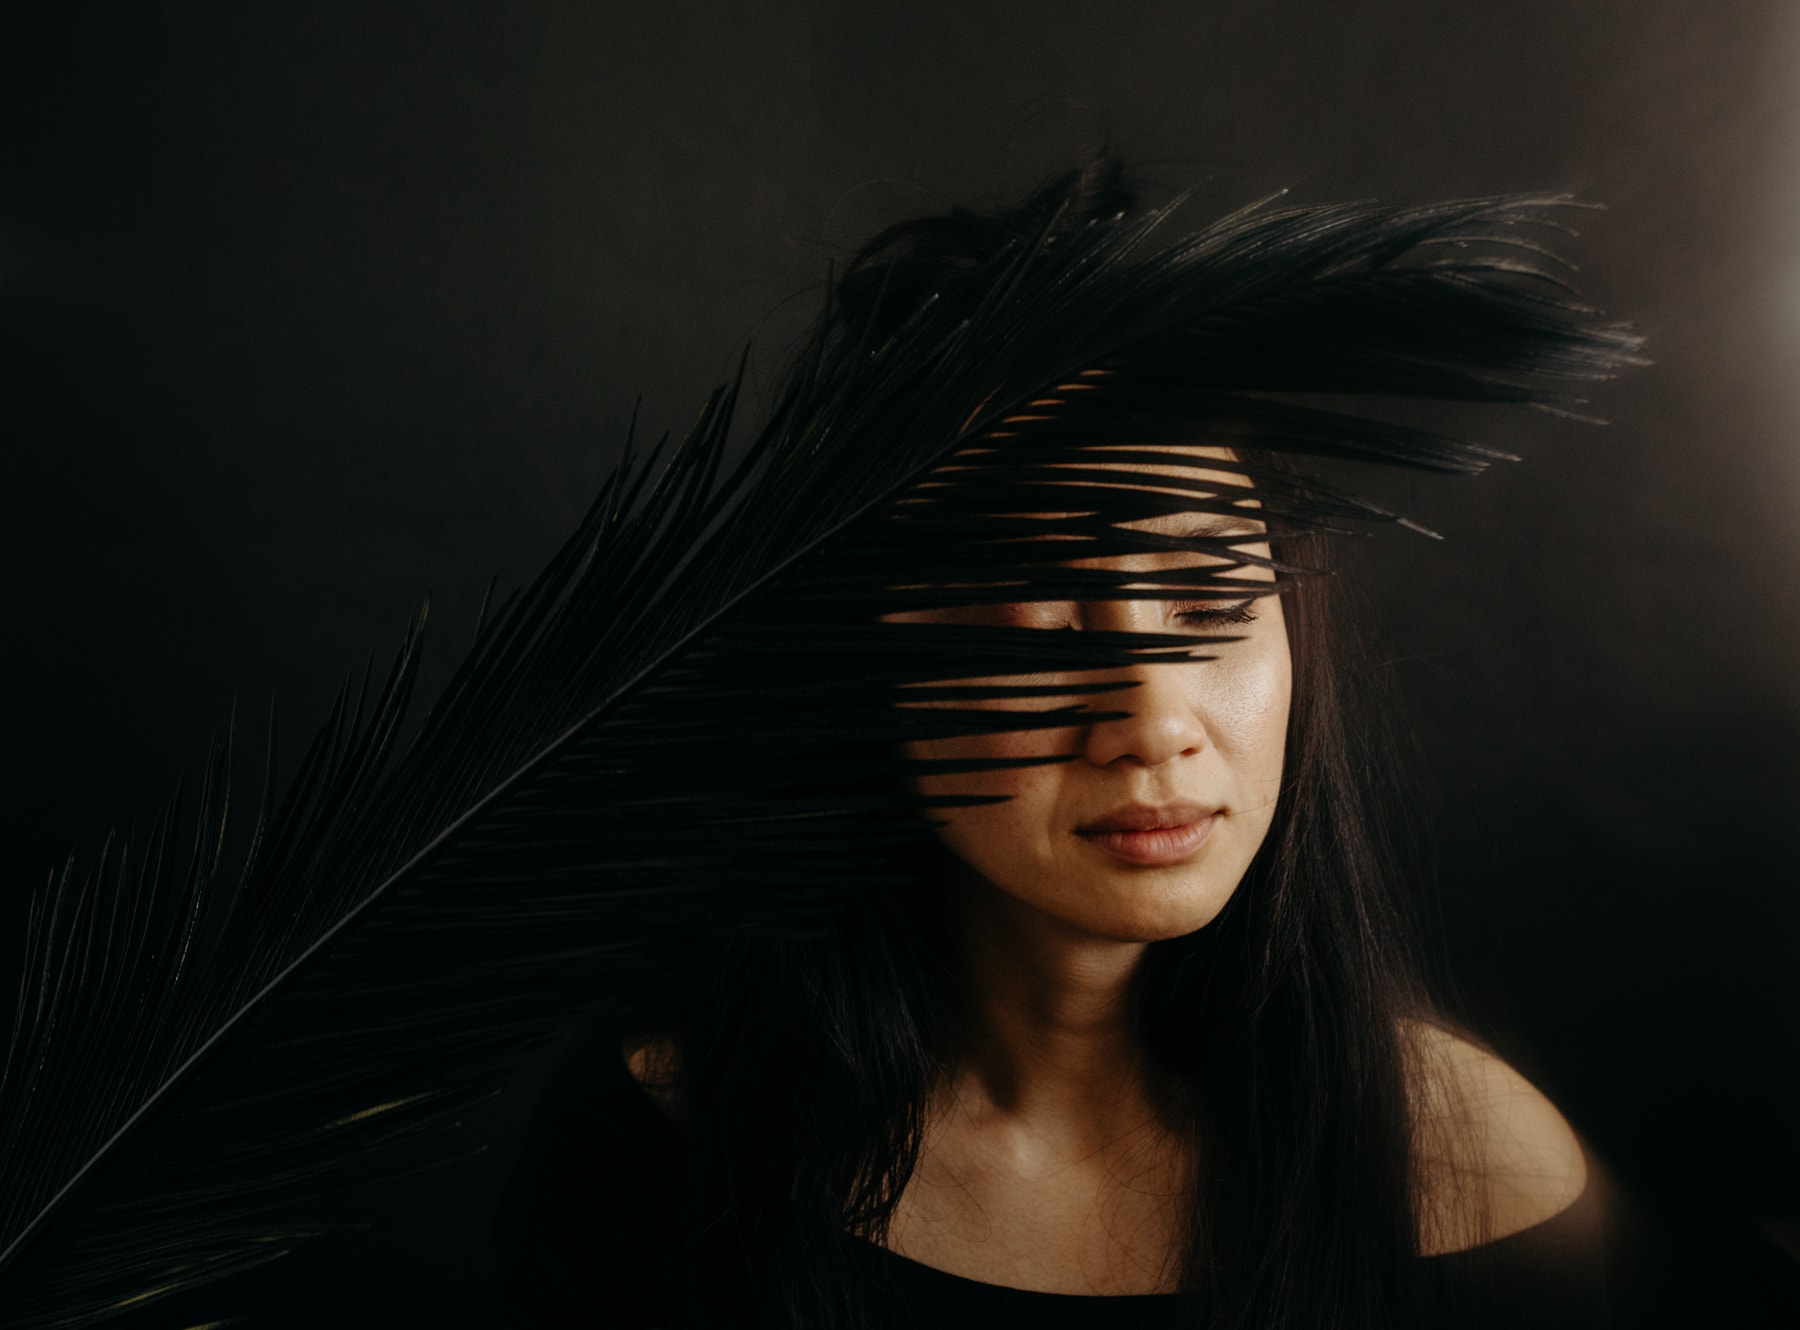 portrait with black palm leaf